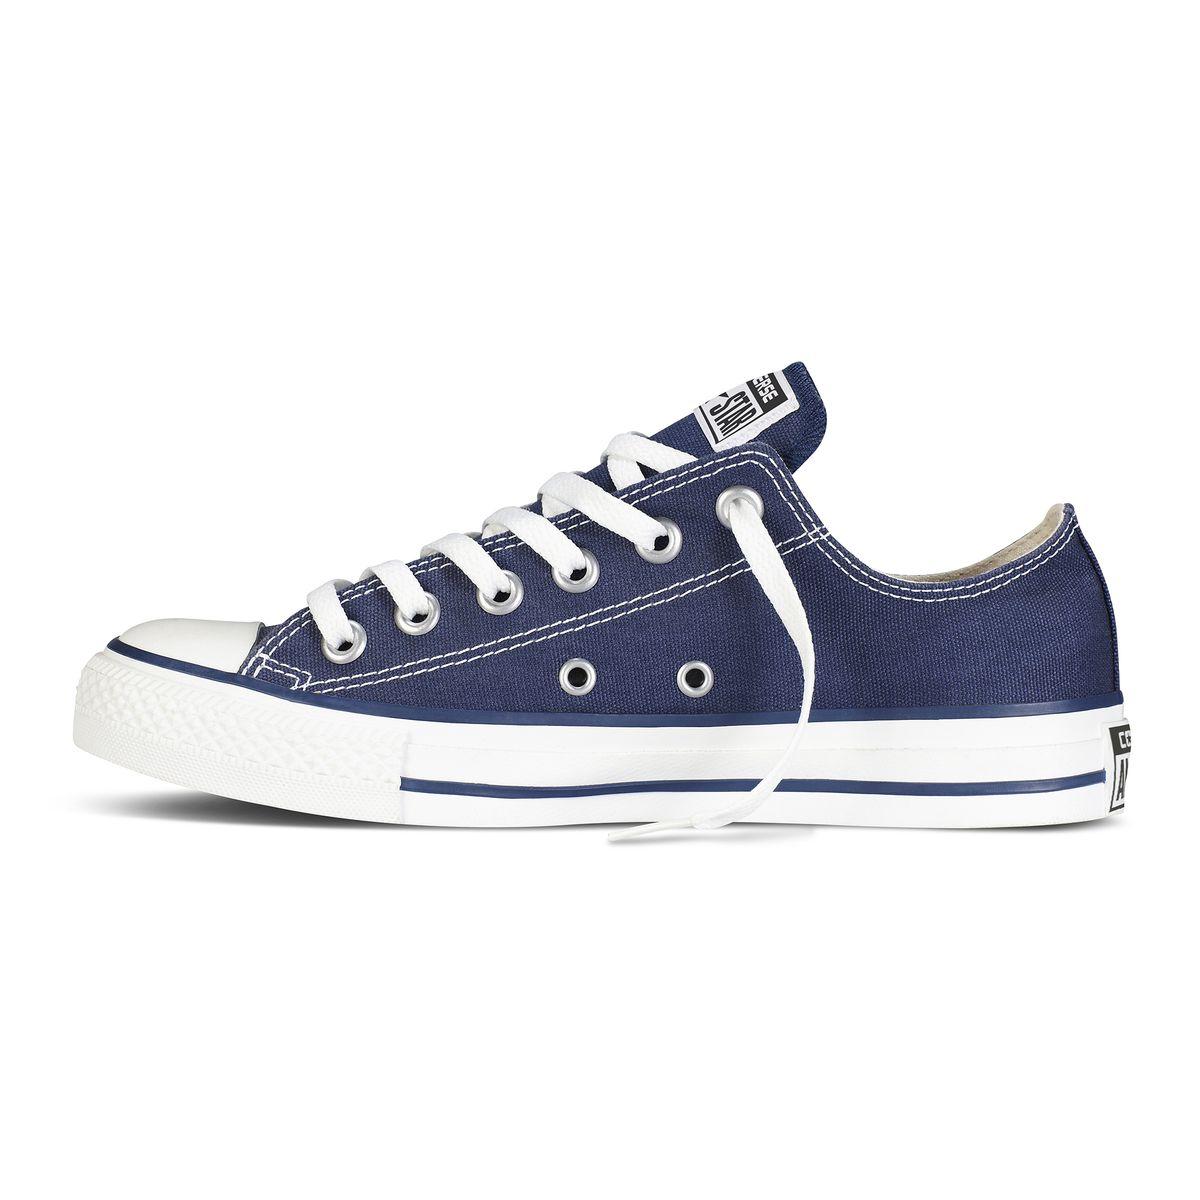 Кеды Converse Chuck Taylor All Star Core кеды женские converse chuck taylor all star цвет синий 163308 размер 5 37 5